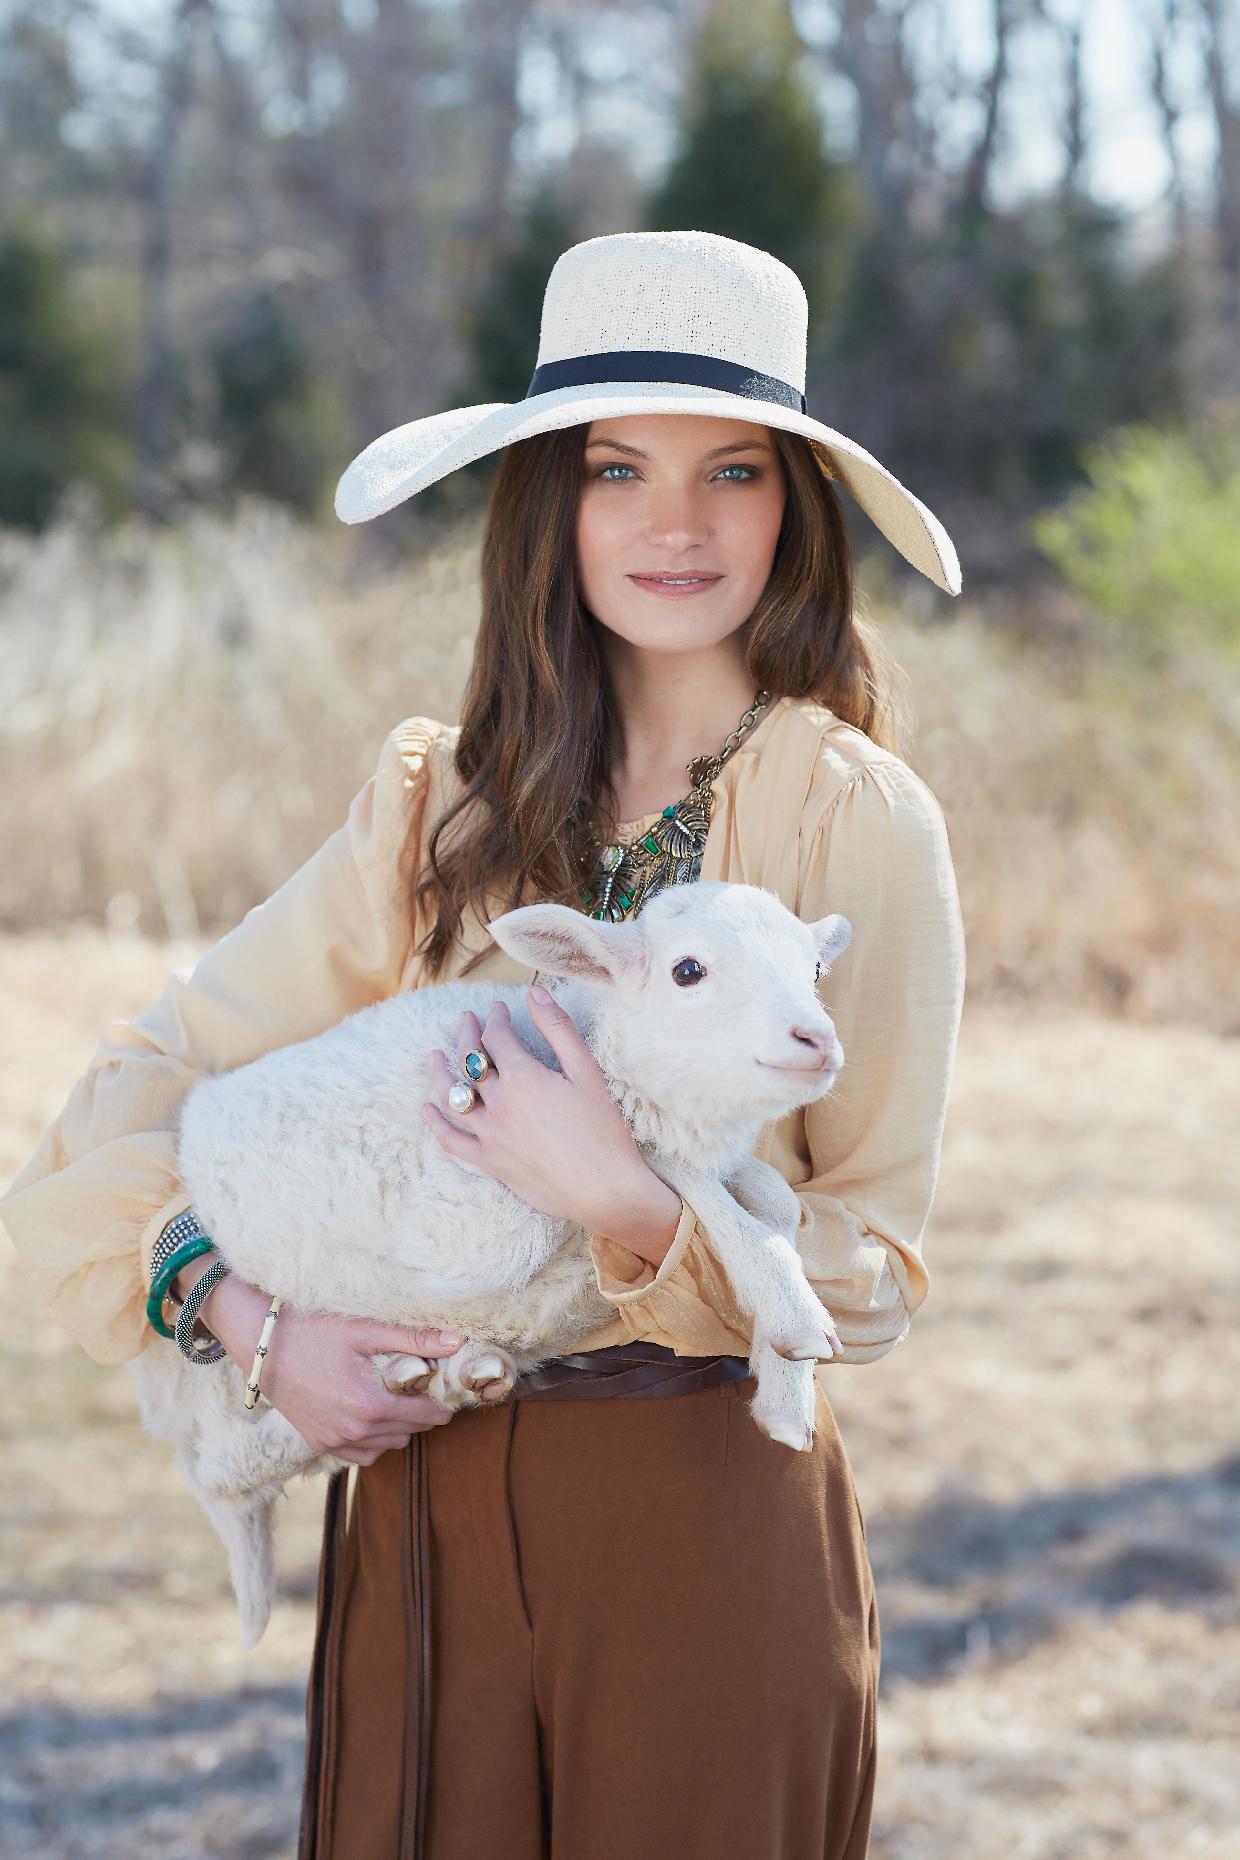 Fashionable Farmer : holding a lamb